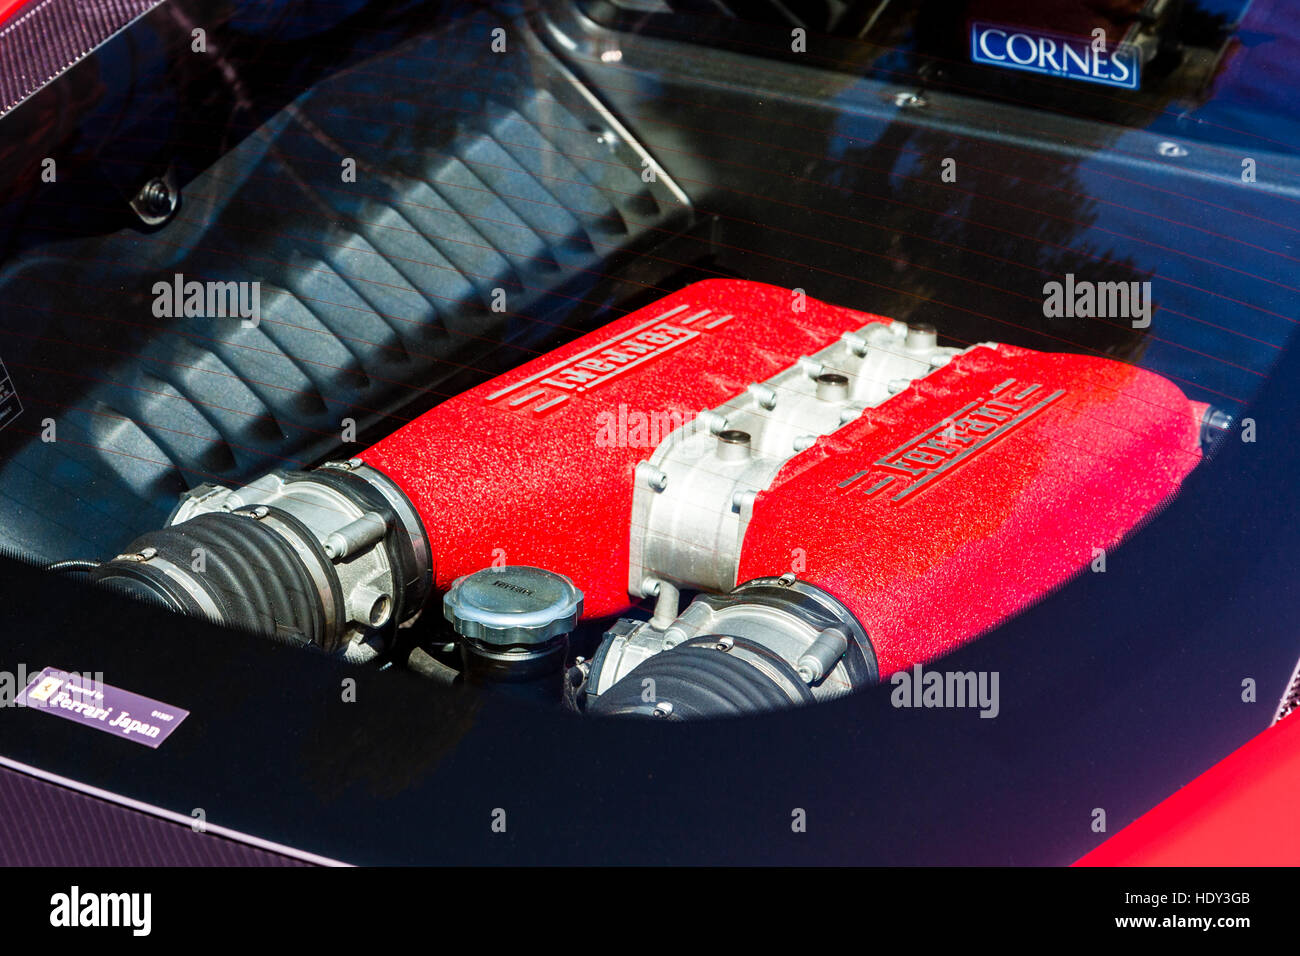 Japan. Red Ferrari 458 Italia car. View of part of F136 V8